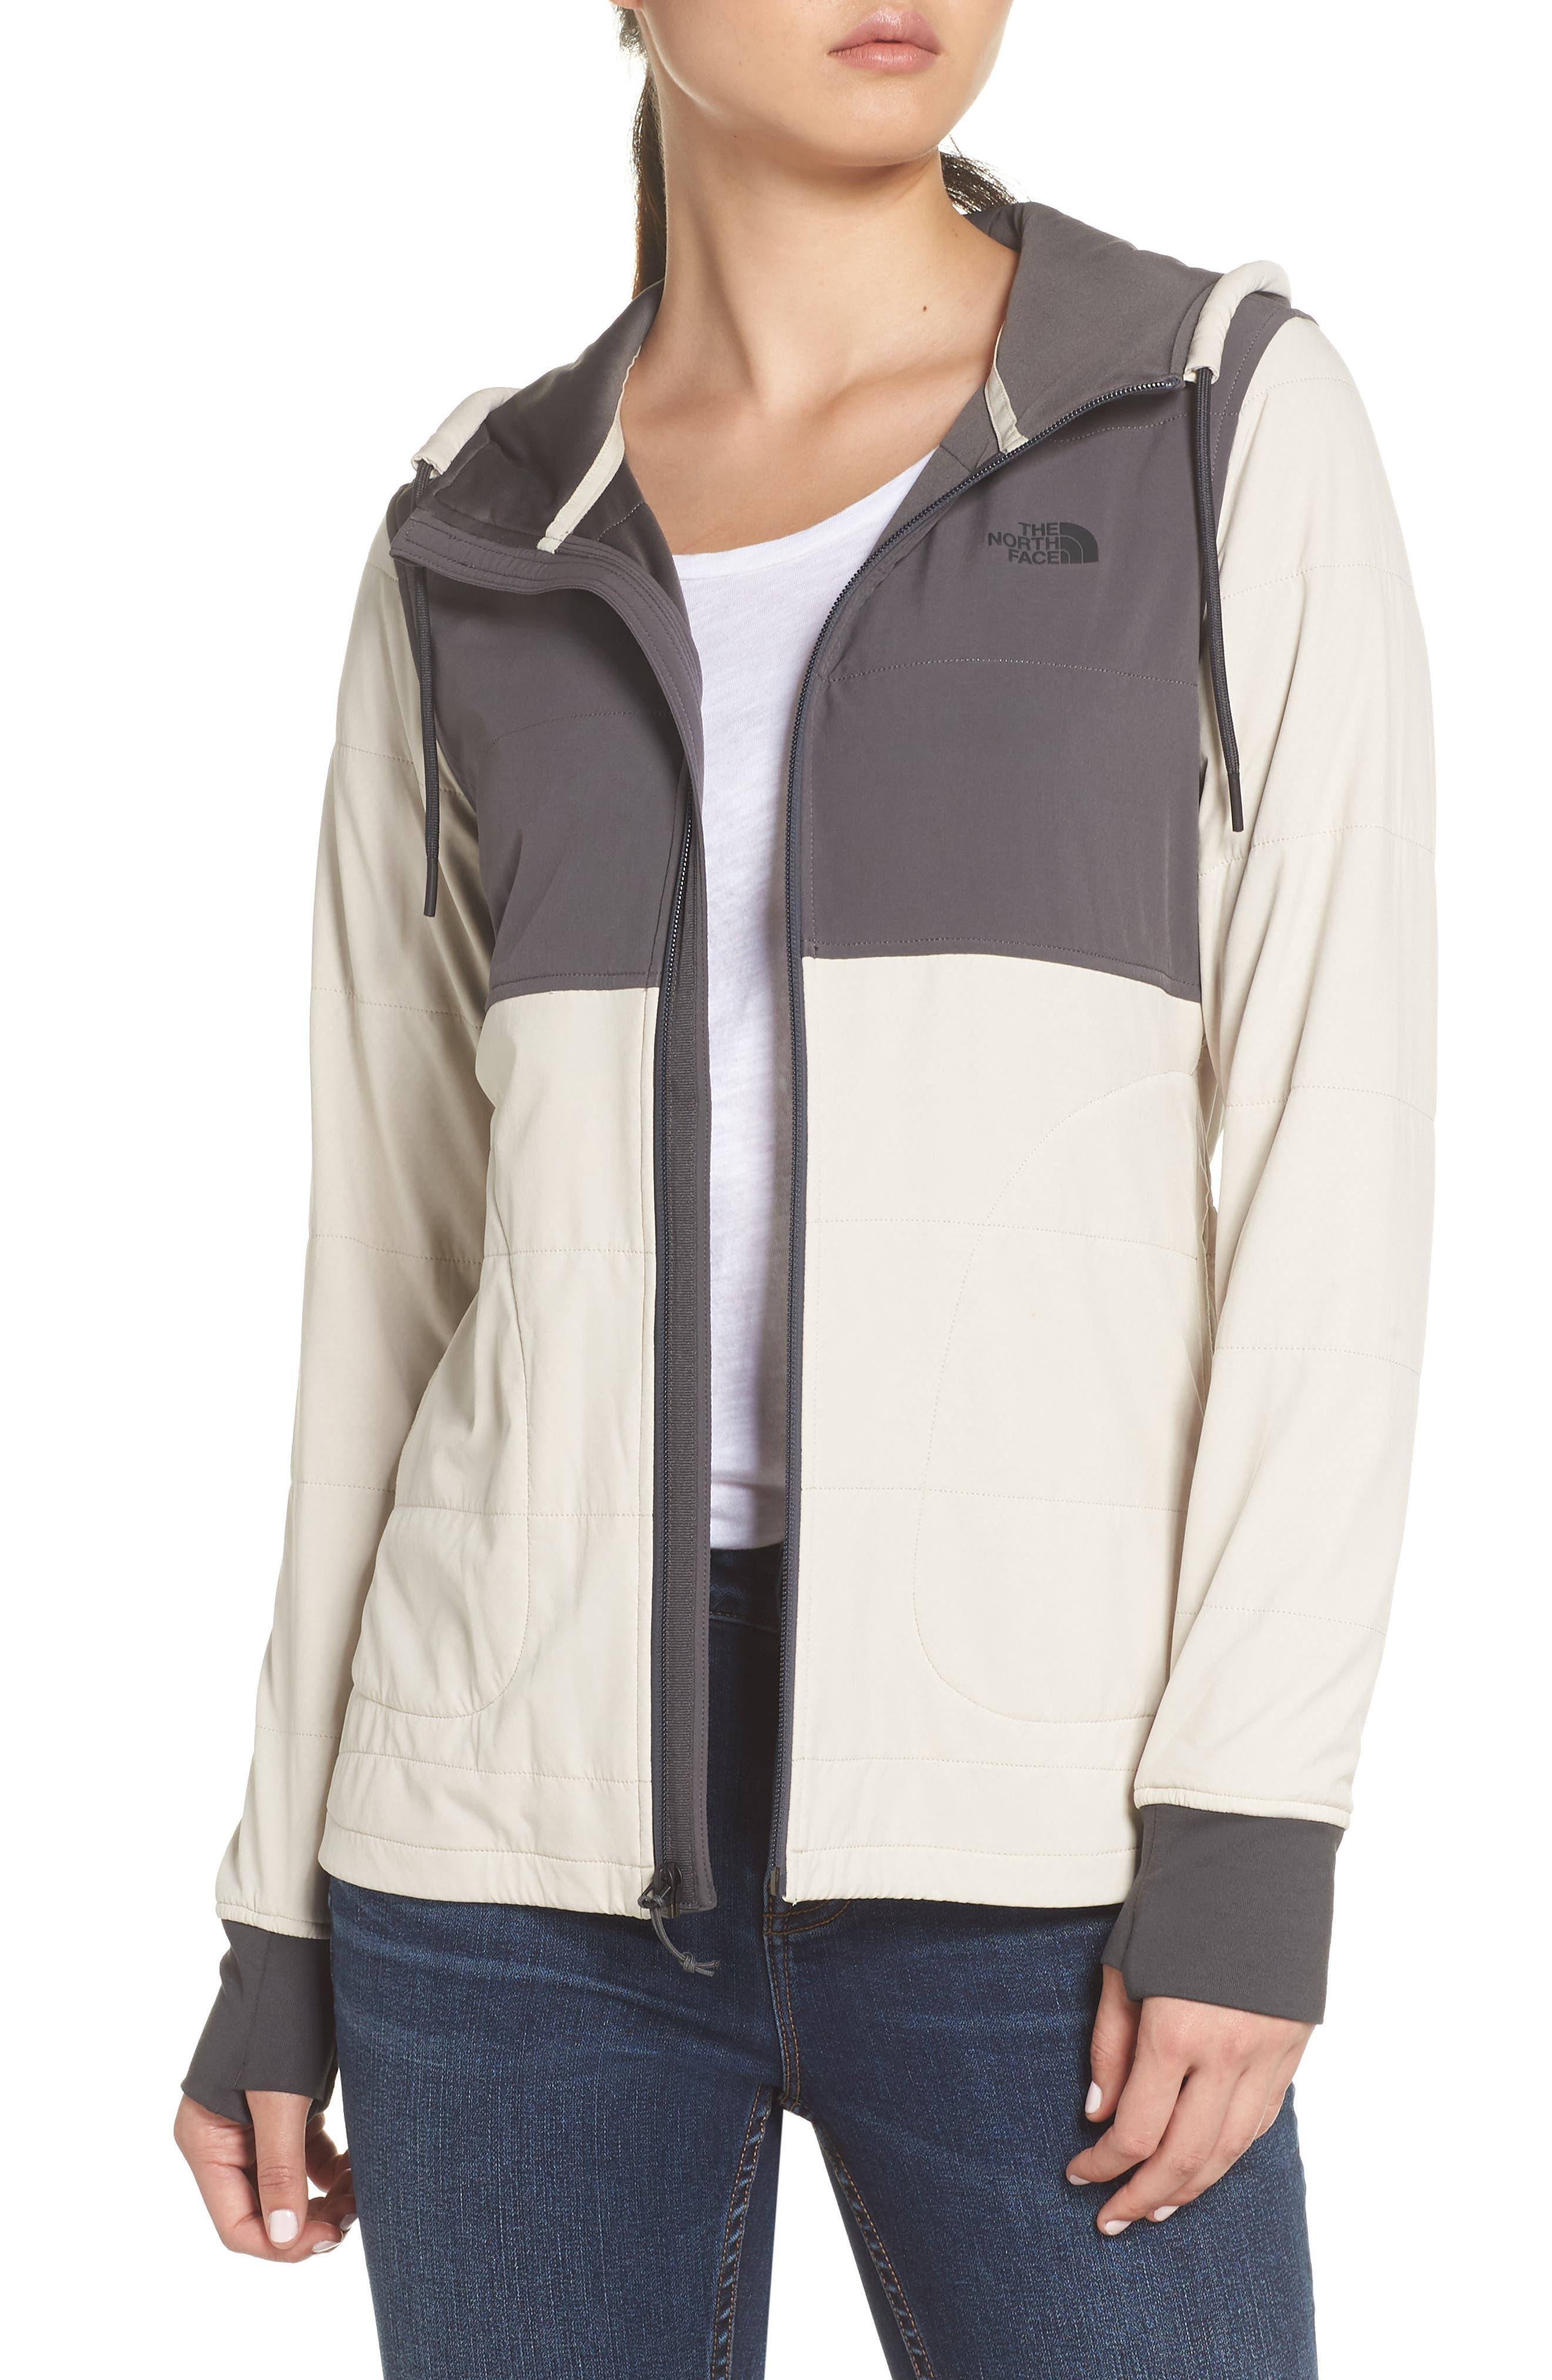 Mountain Zip Hooded Sweatshirt,                             Main thumbnail 1, color,                             PEYOTE BEIGE/ GRAPHITE GREY